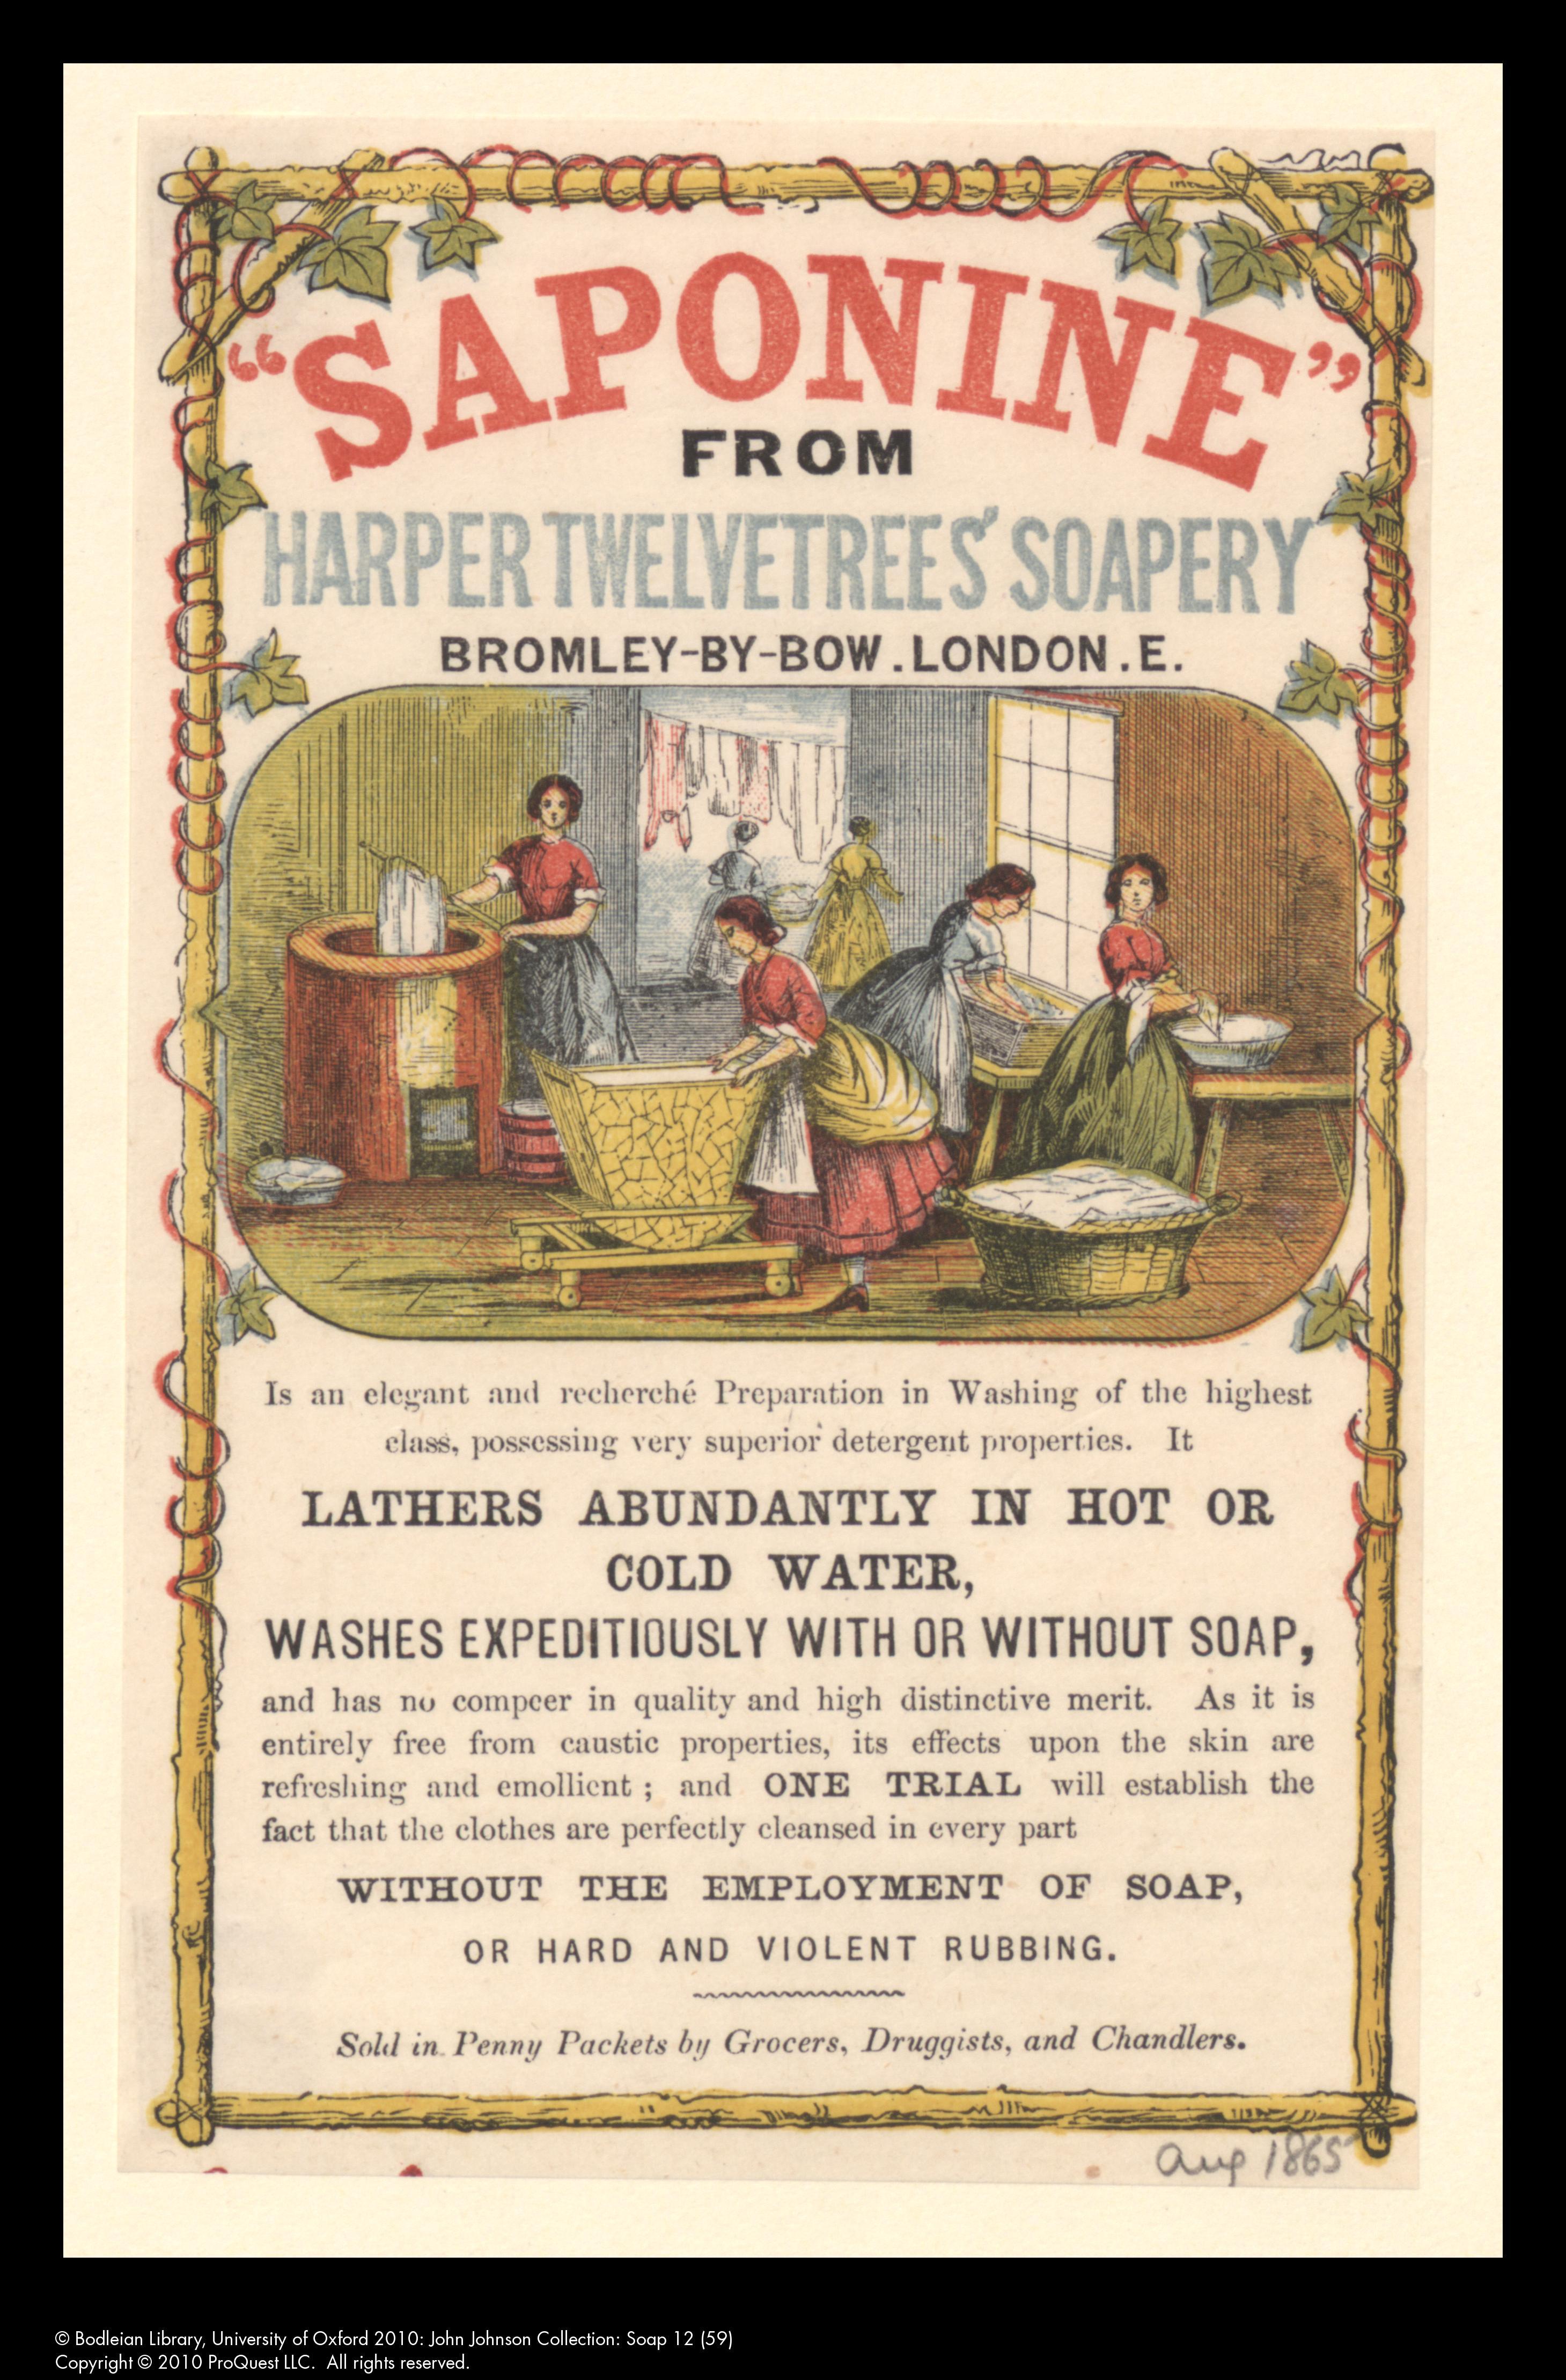 Saponine advertisement, 1865